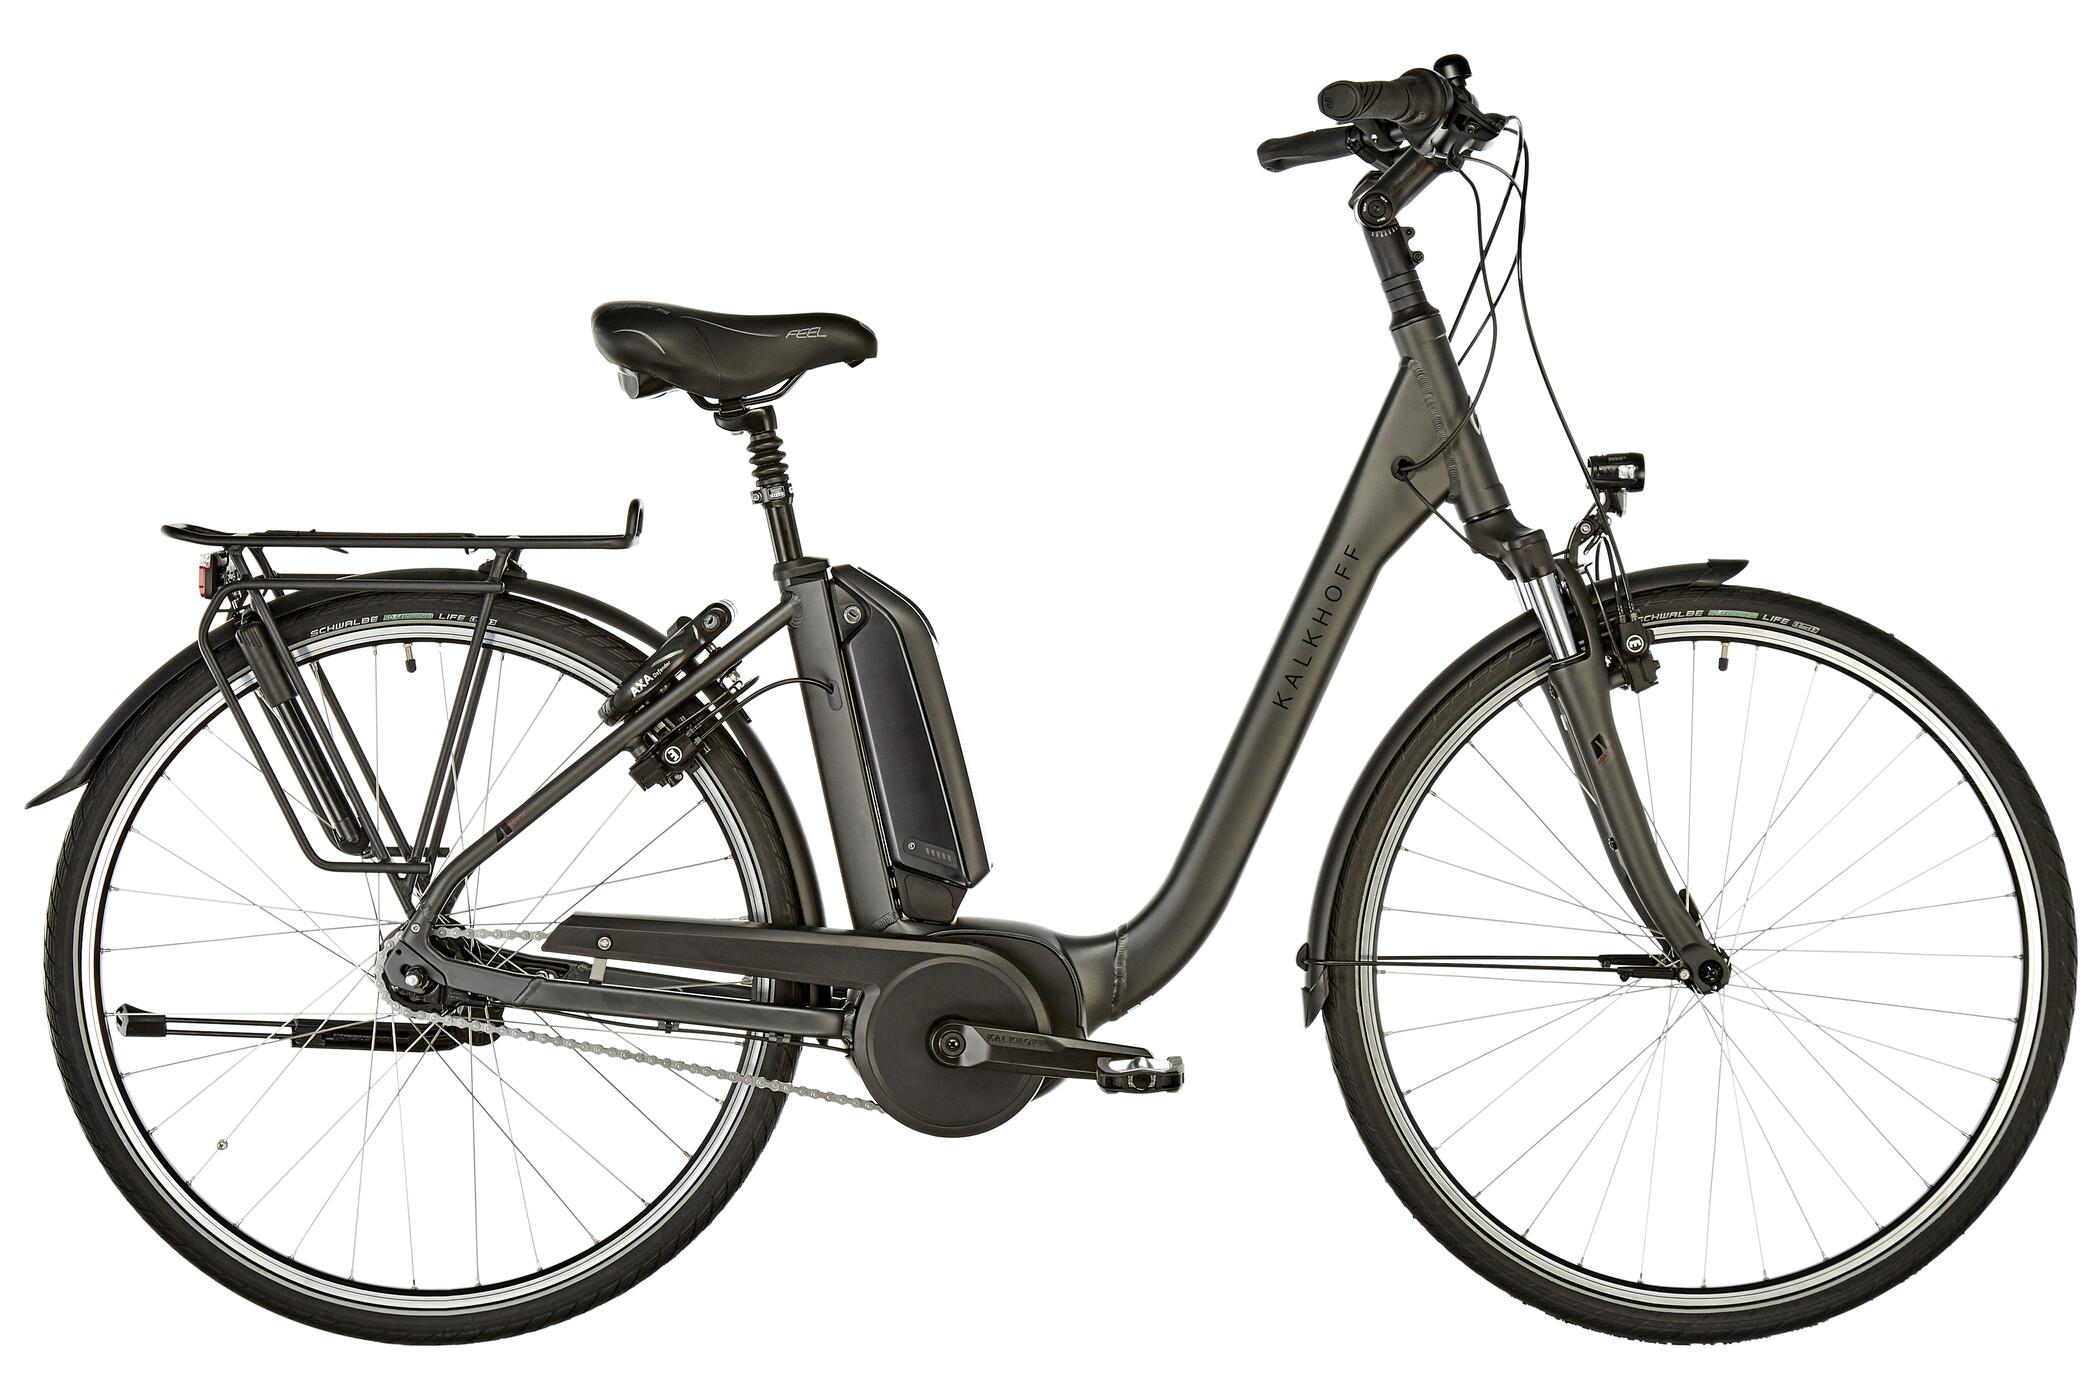 Kalkhoff Agattu B7R Move Comfort E-citybike 400Wh sort (2019) | City